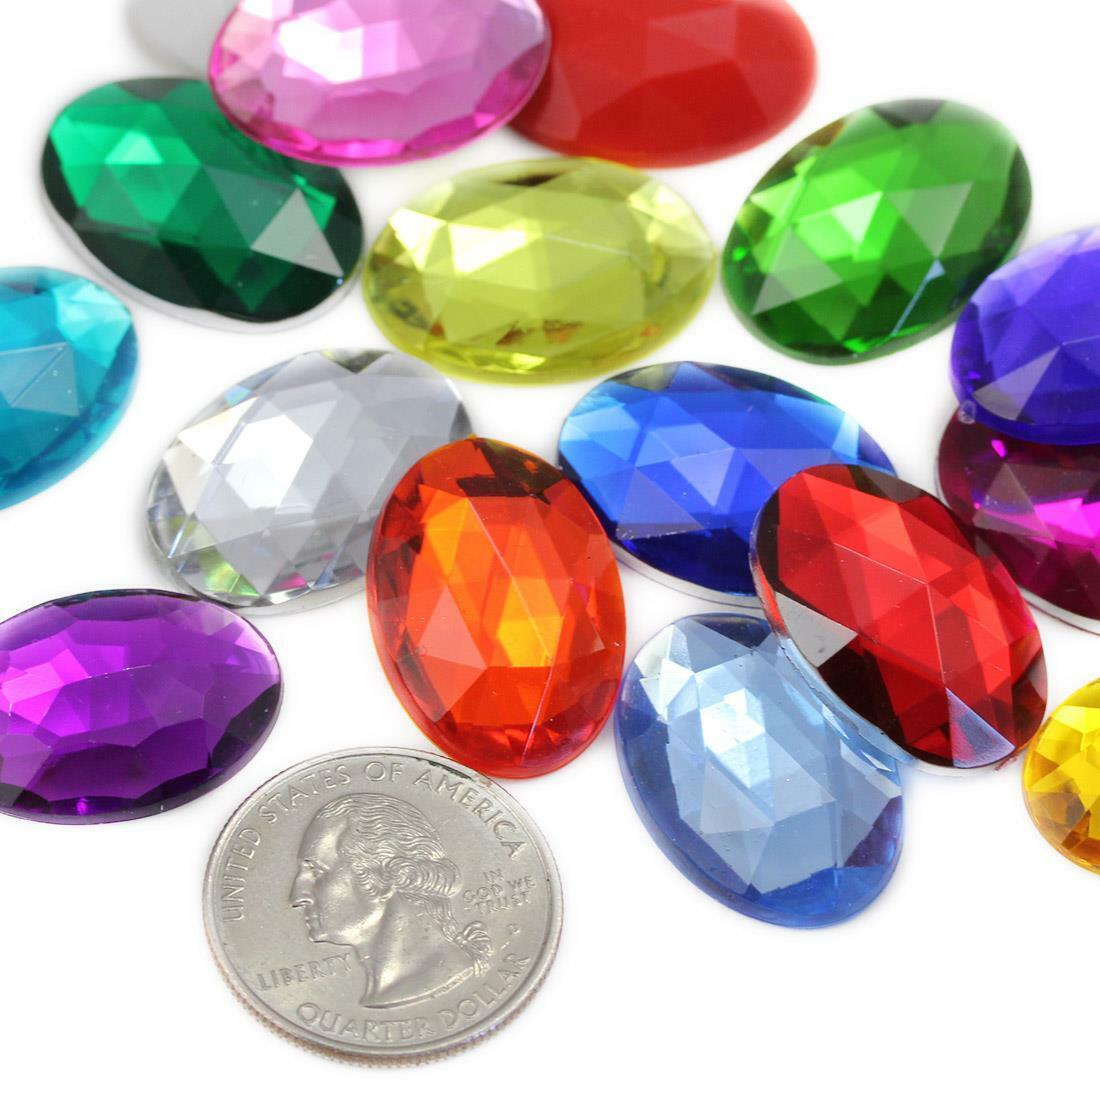 25x18mm Teardrop Pear CLEAR Translucent Foil Flat Back Sew On Acrylic Gems Bead